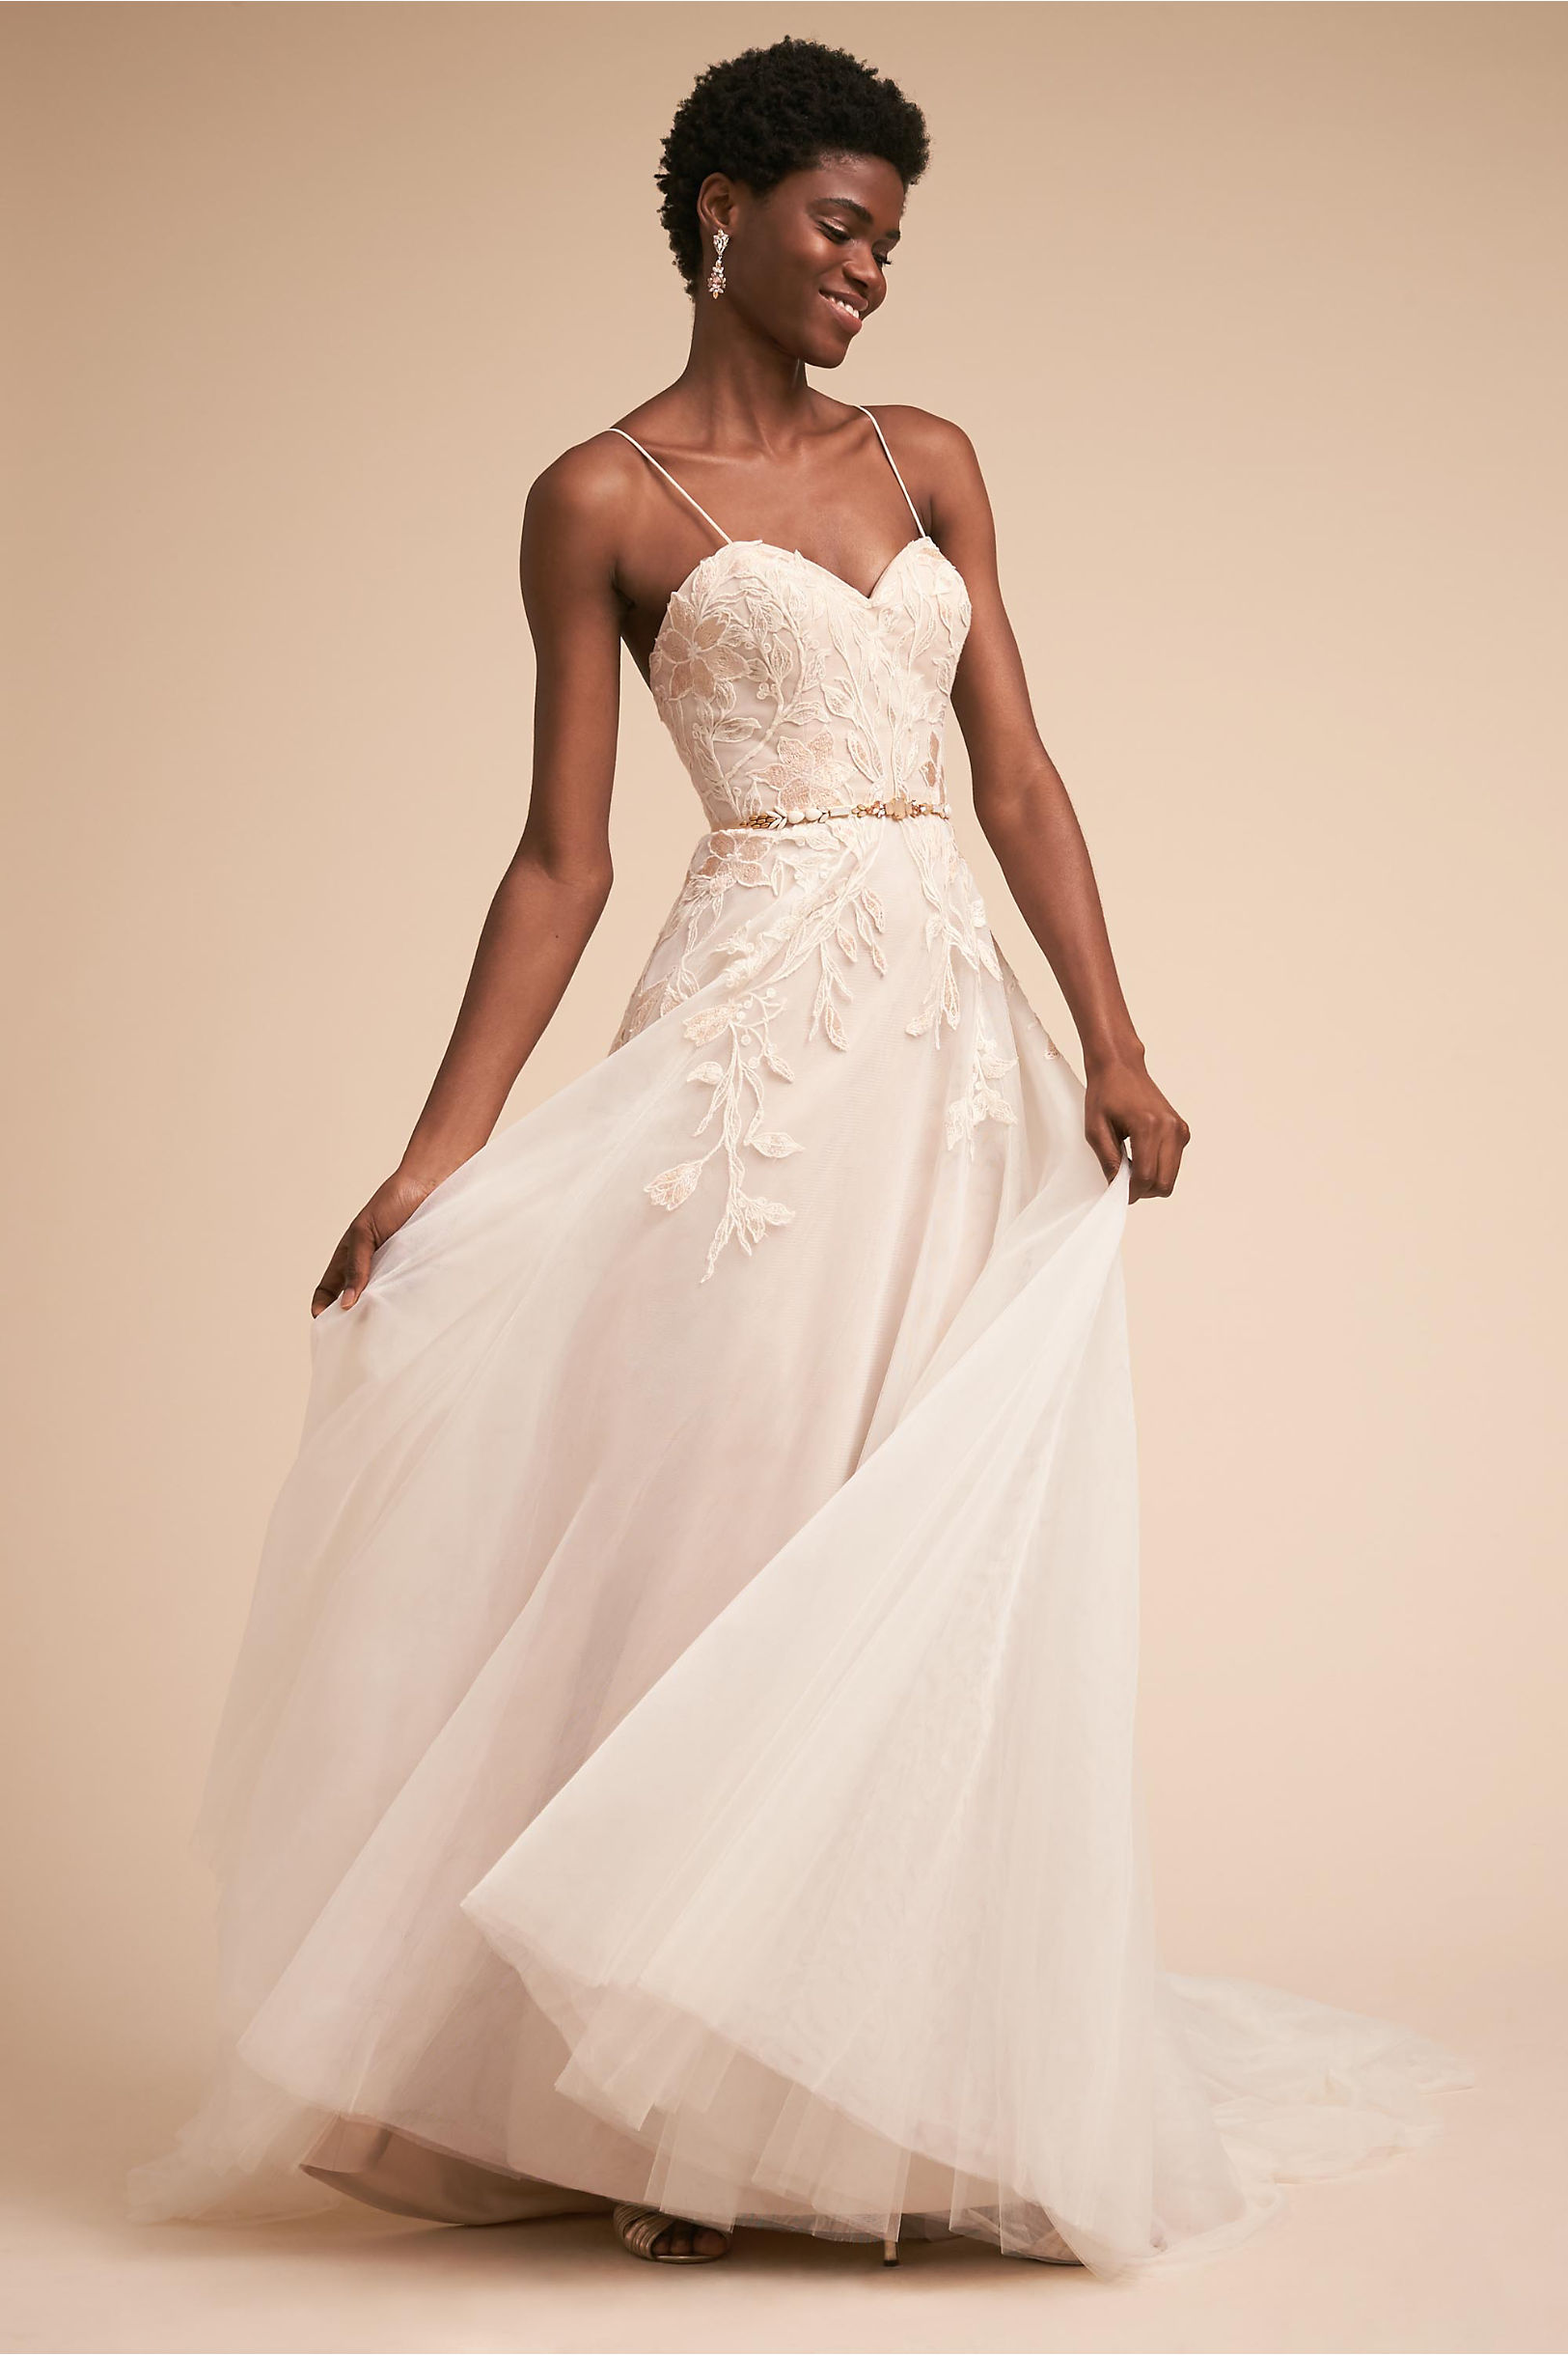 "d04a2c52a73 Guinevere a line wedding dress flower embellishments sweetheart neck ti  adora bhldn spring 2018 """